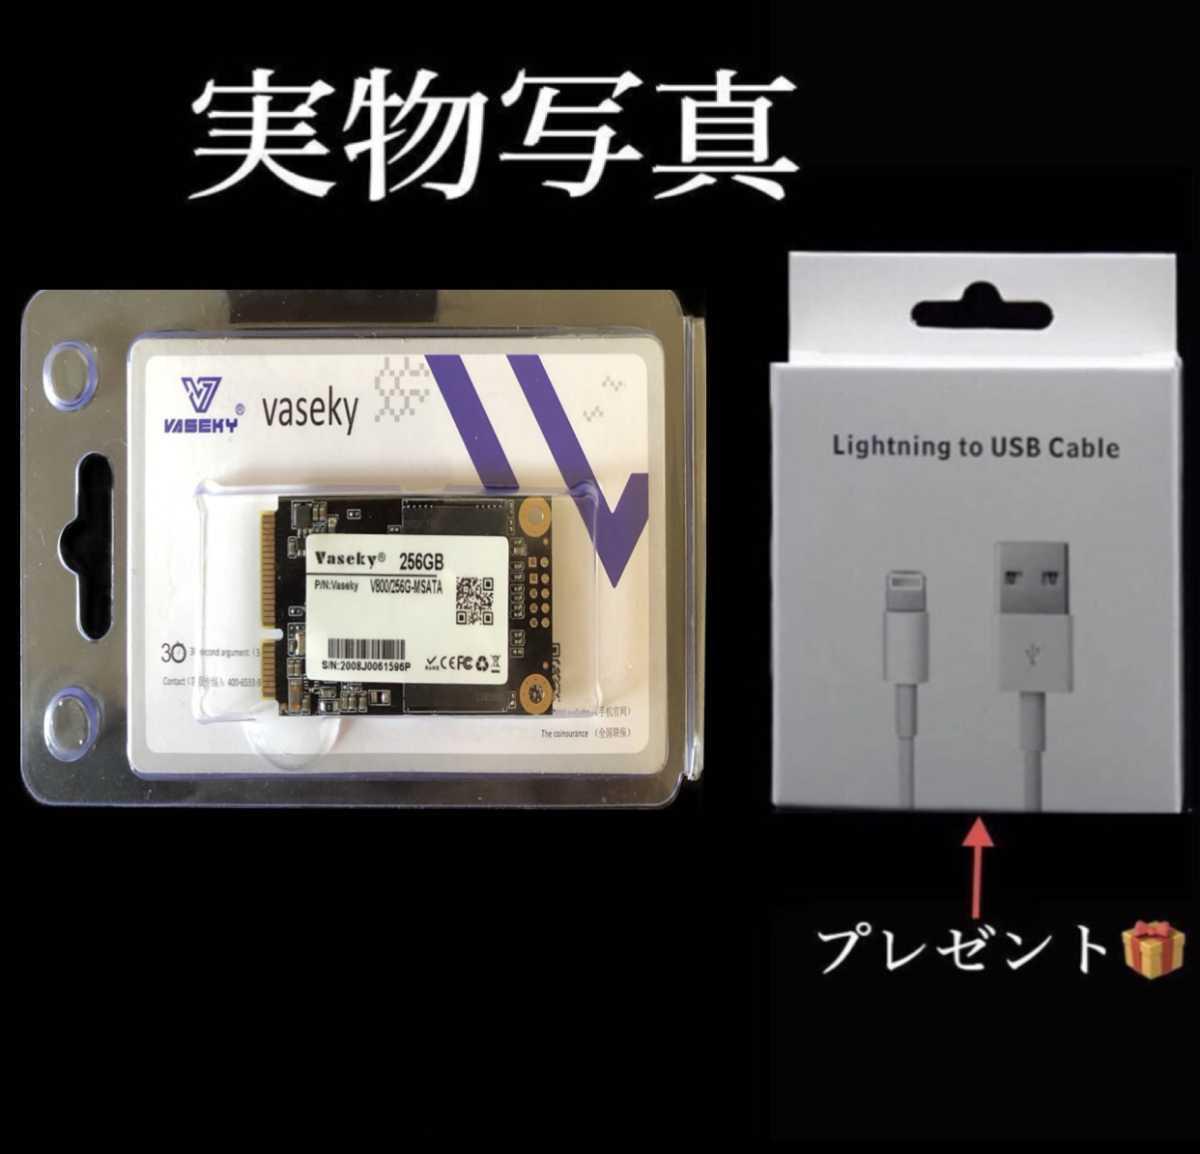 SSD 256GB mSATA Vaseky 新品 未開封SSD mSATA 256GB テレワーク推薦品 (送料無料 プレゼント付)